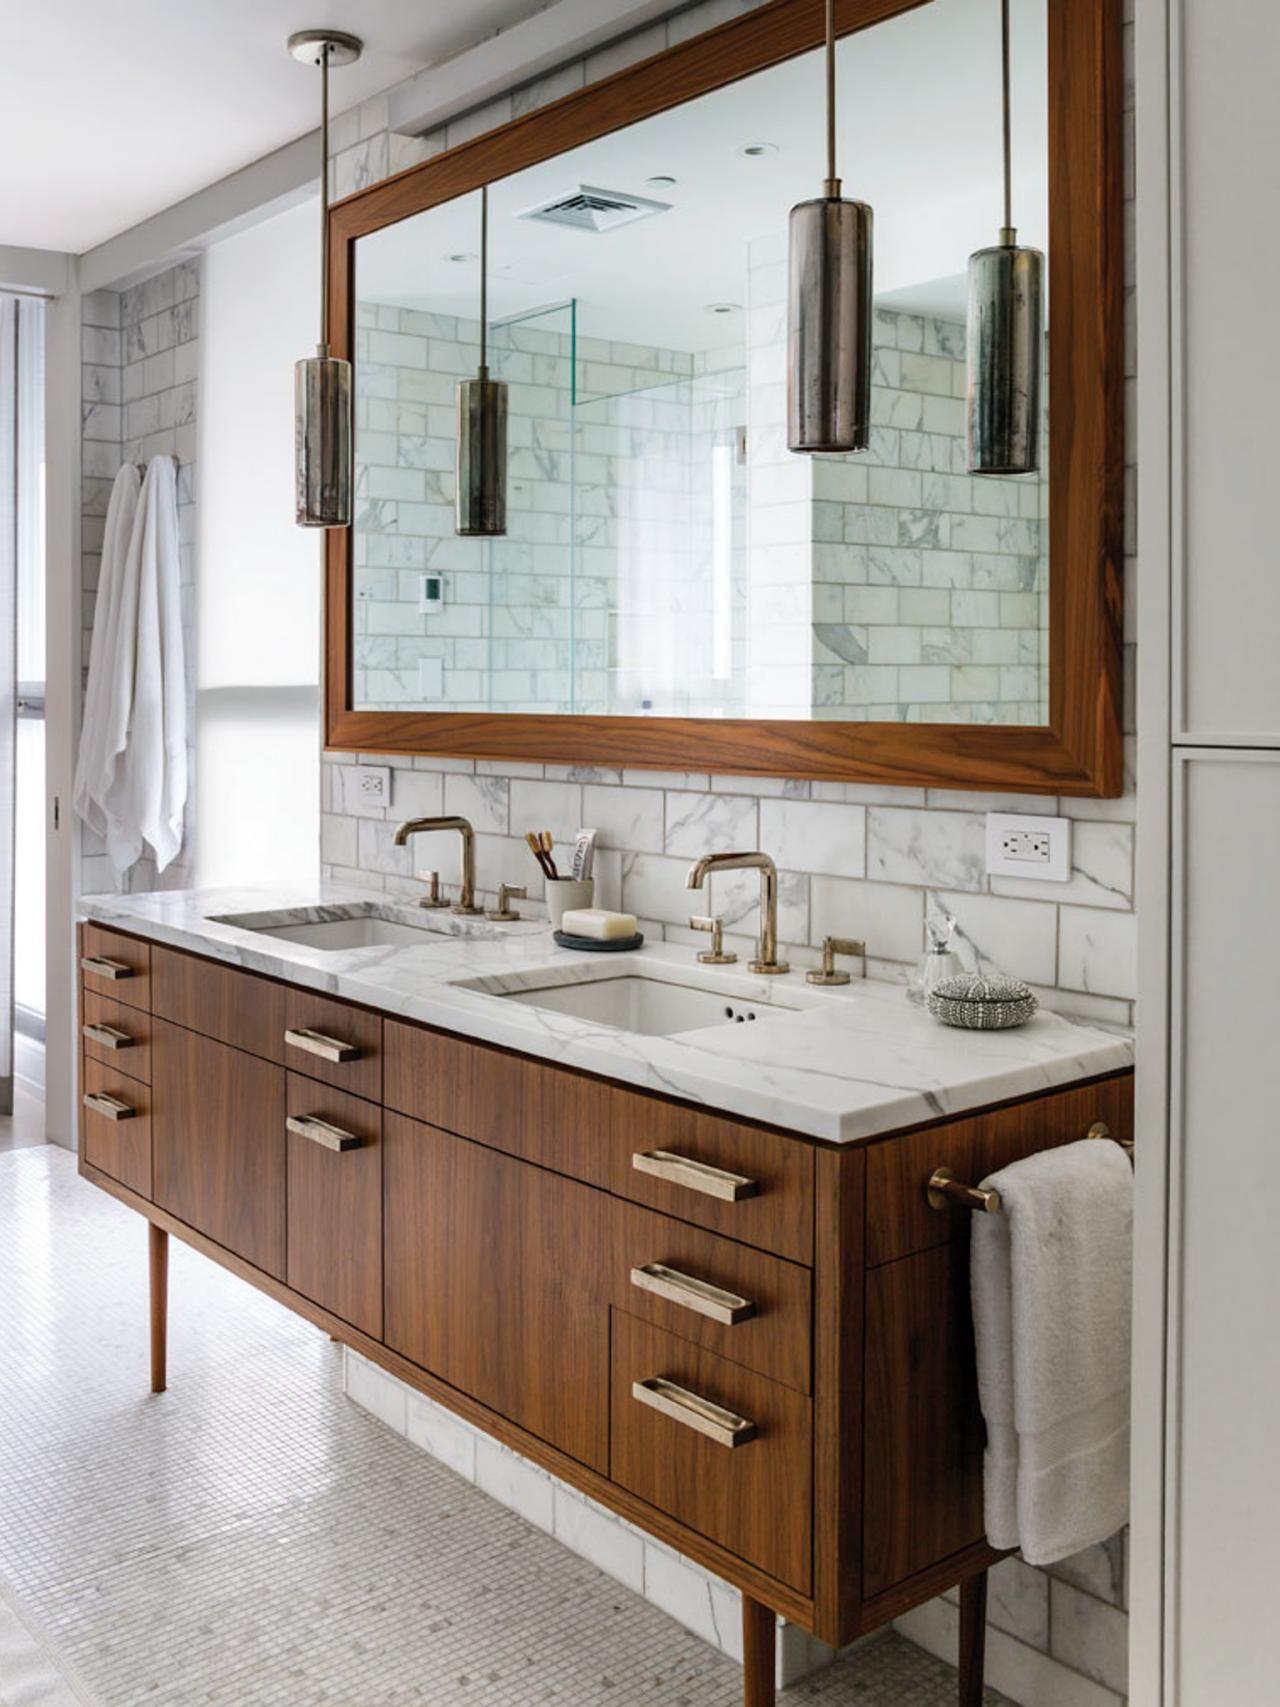 Photo Page Photo Library Hgtv Stylish Bathroom Mid Century Modern Bathroom Modern Bathroom [ 1707 x 1280 Pixel ]